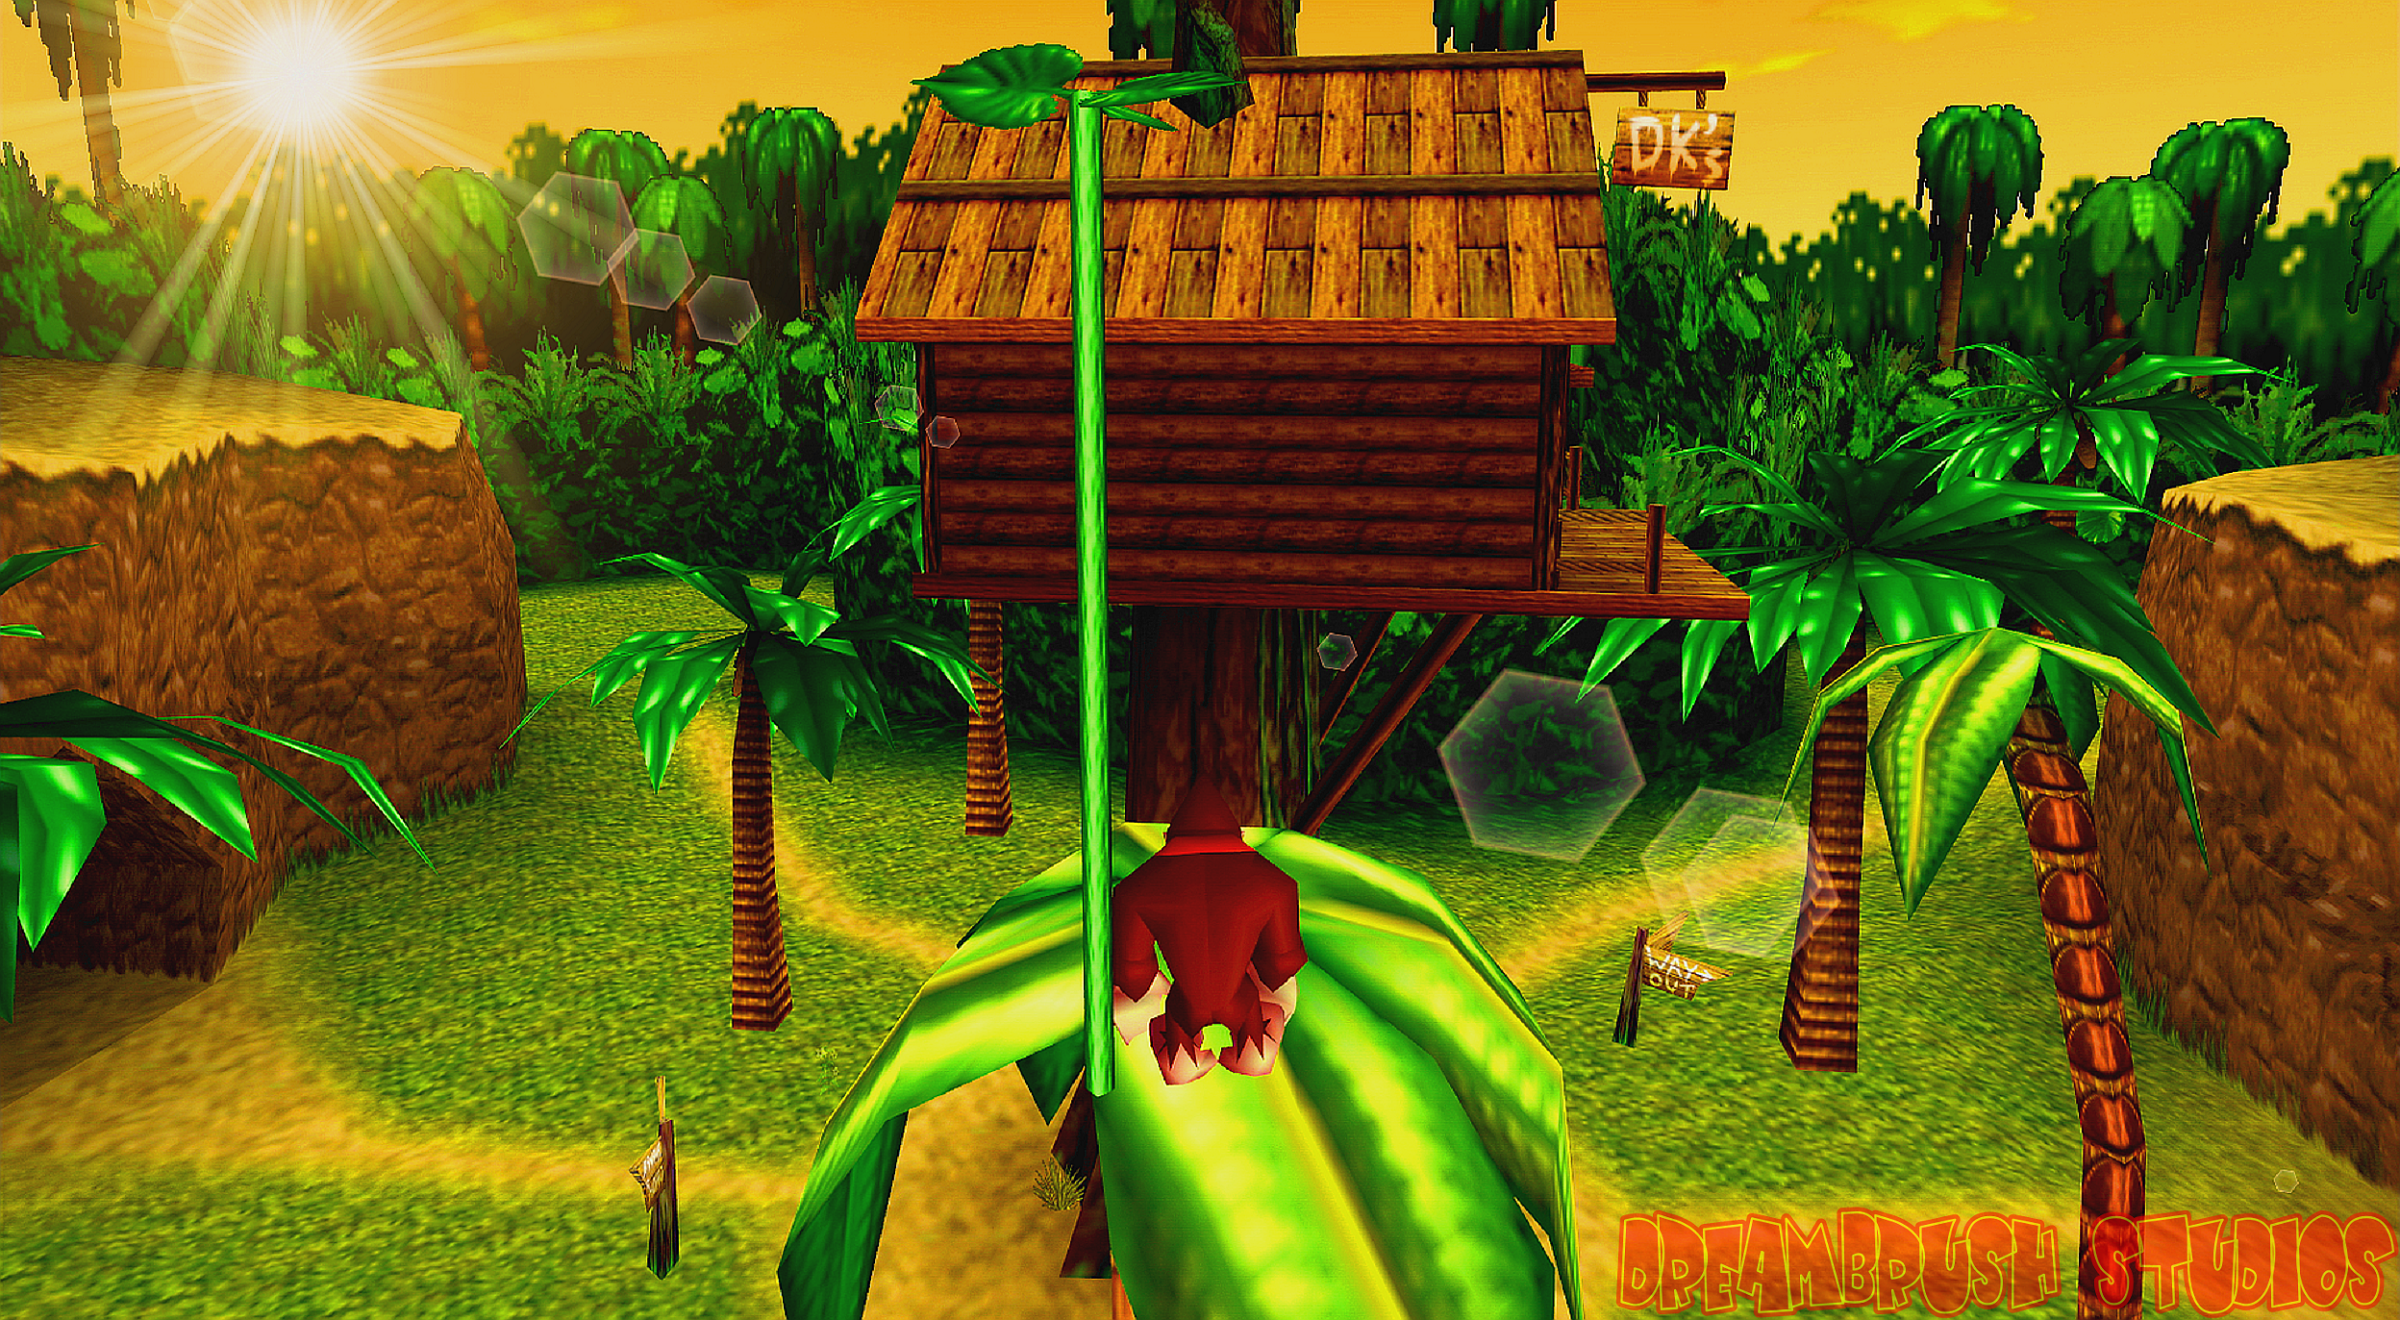 Cool Wallpaper Home Screen Donkey Kong - dce239a51a647c817ac564083f4a01ec  Pic_549314.png